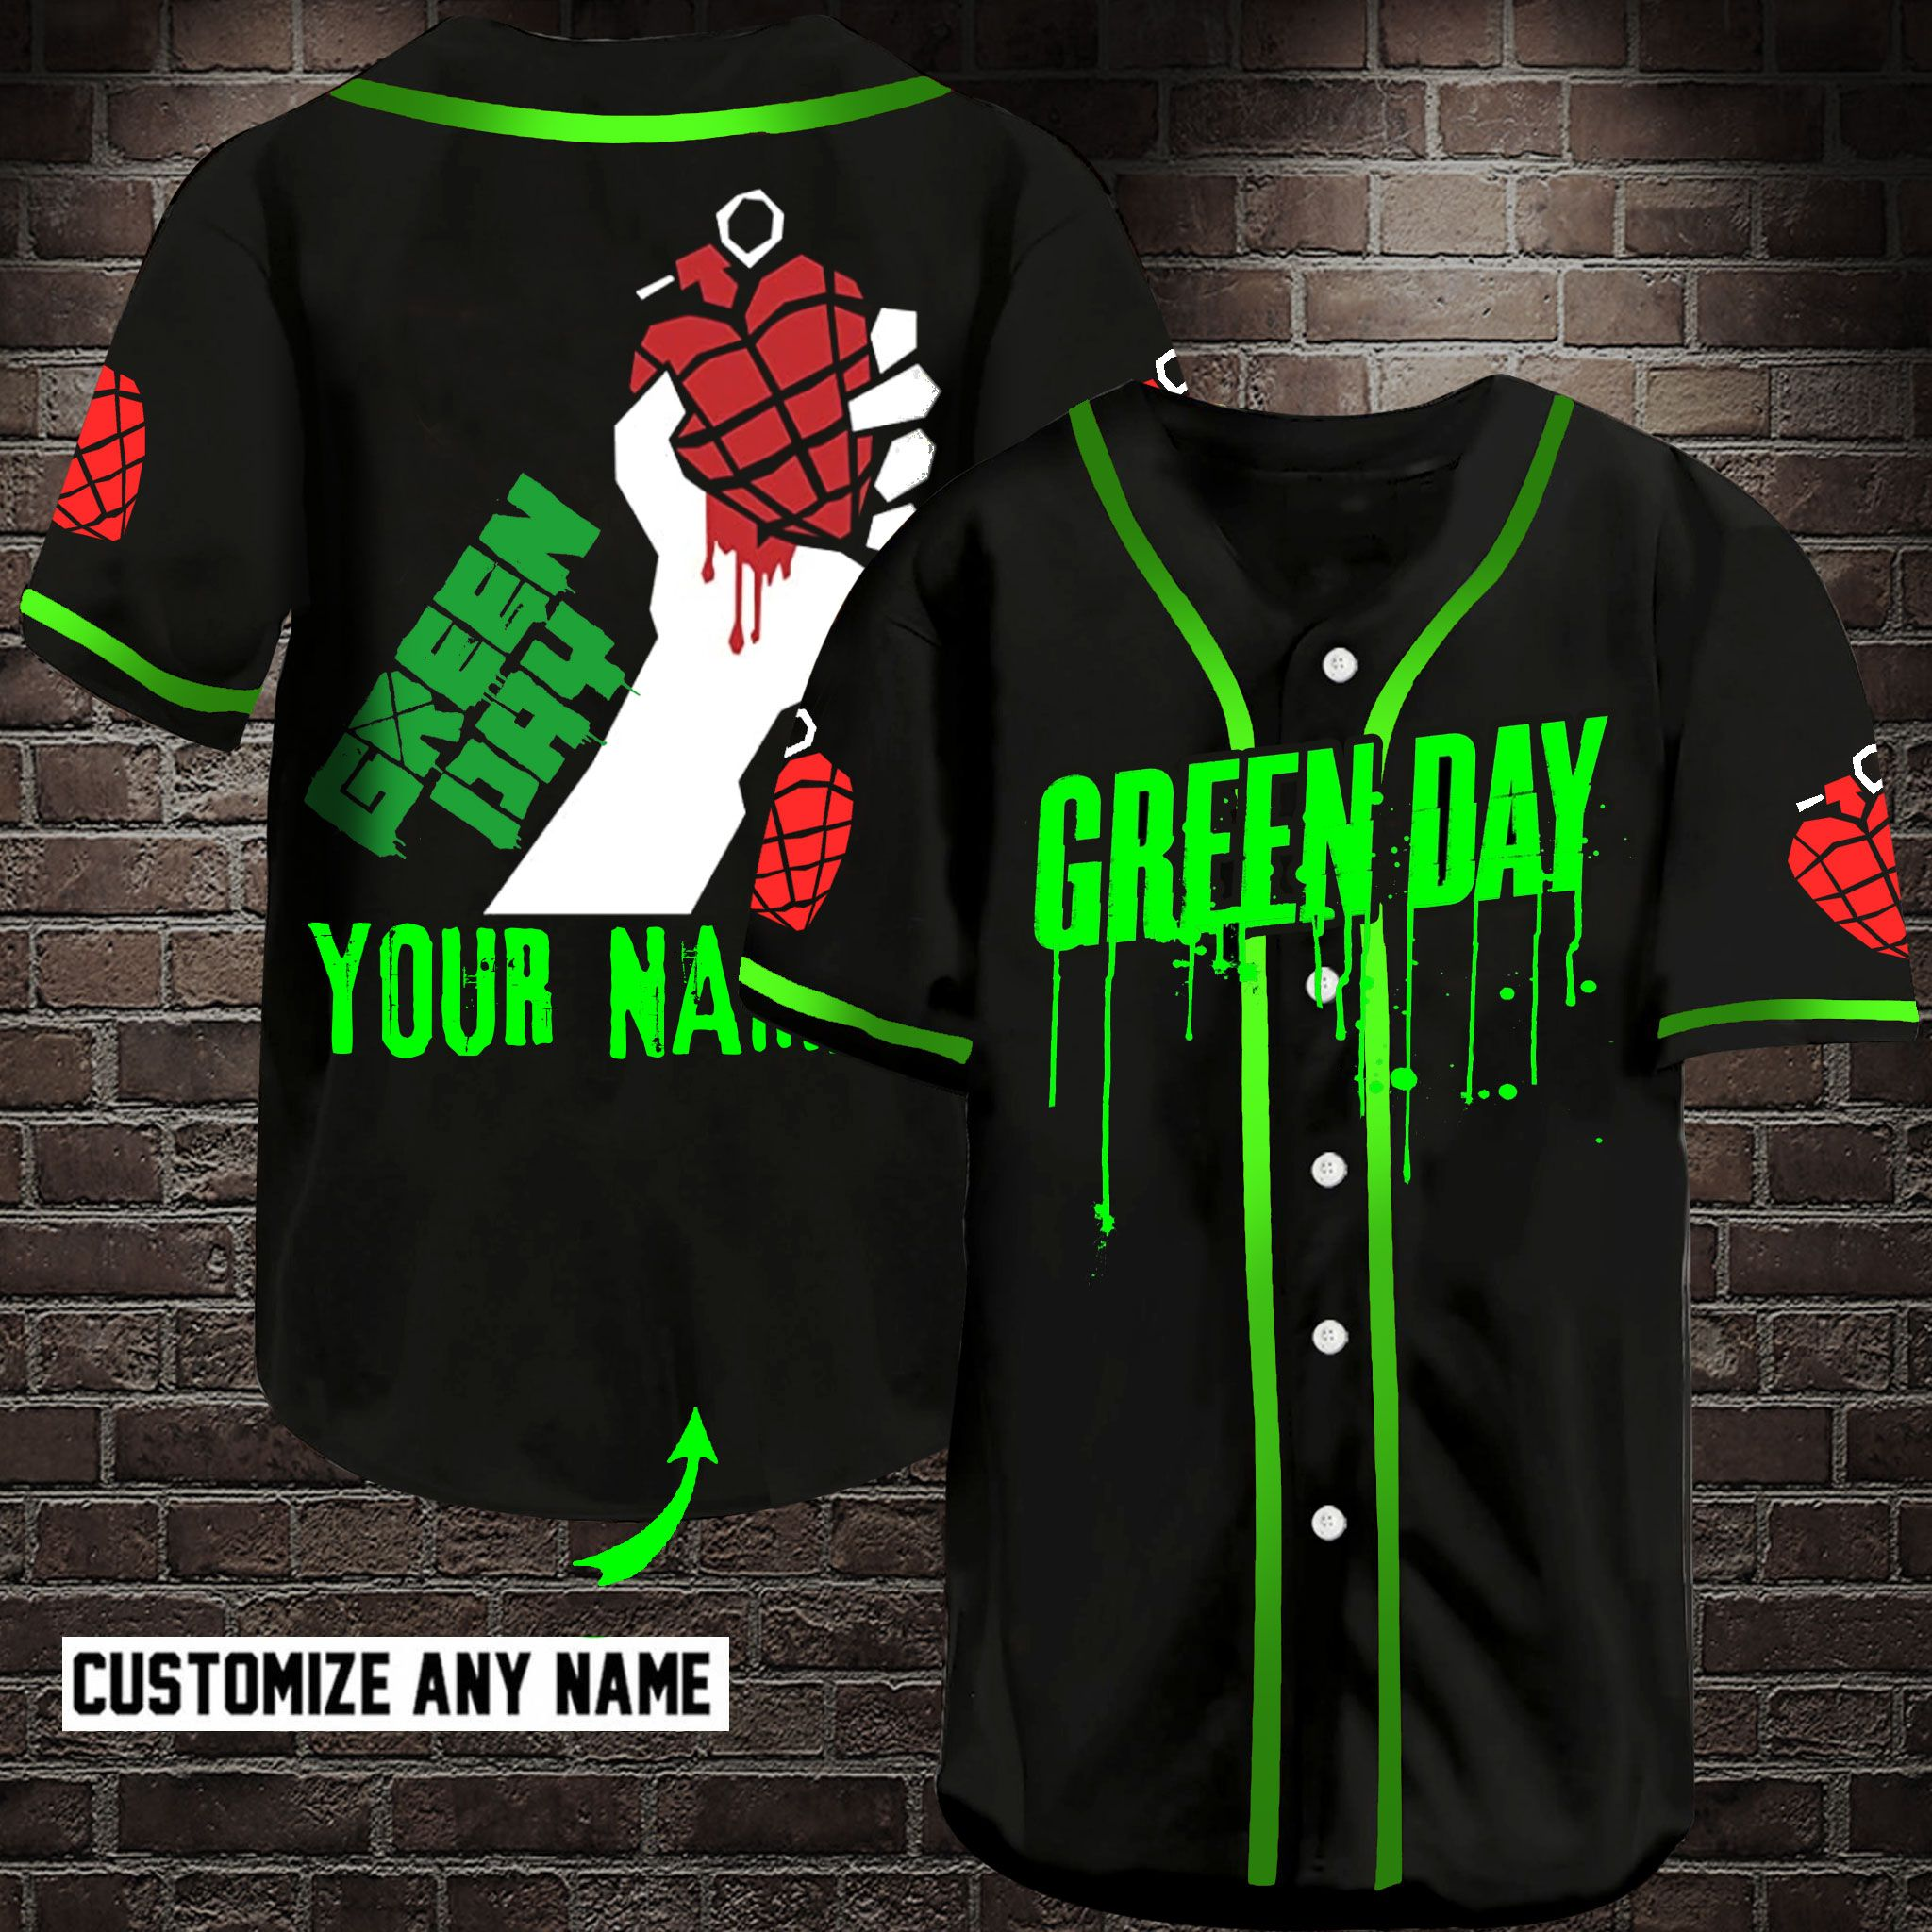 Green Day Customize Name Baseball Jersey Shirt